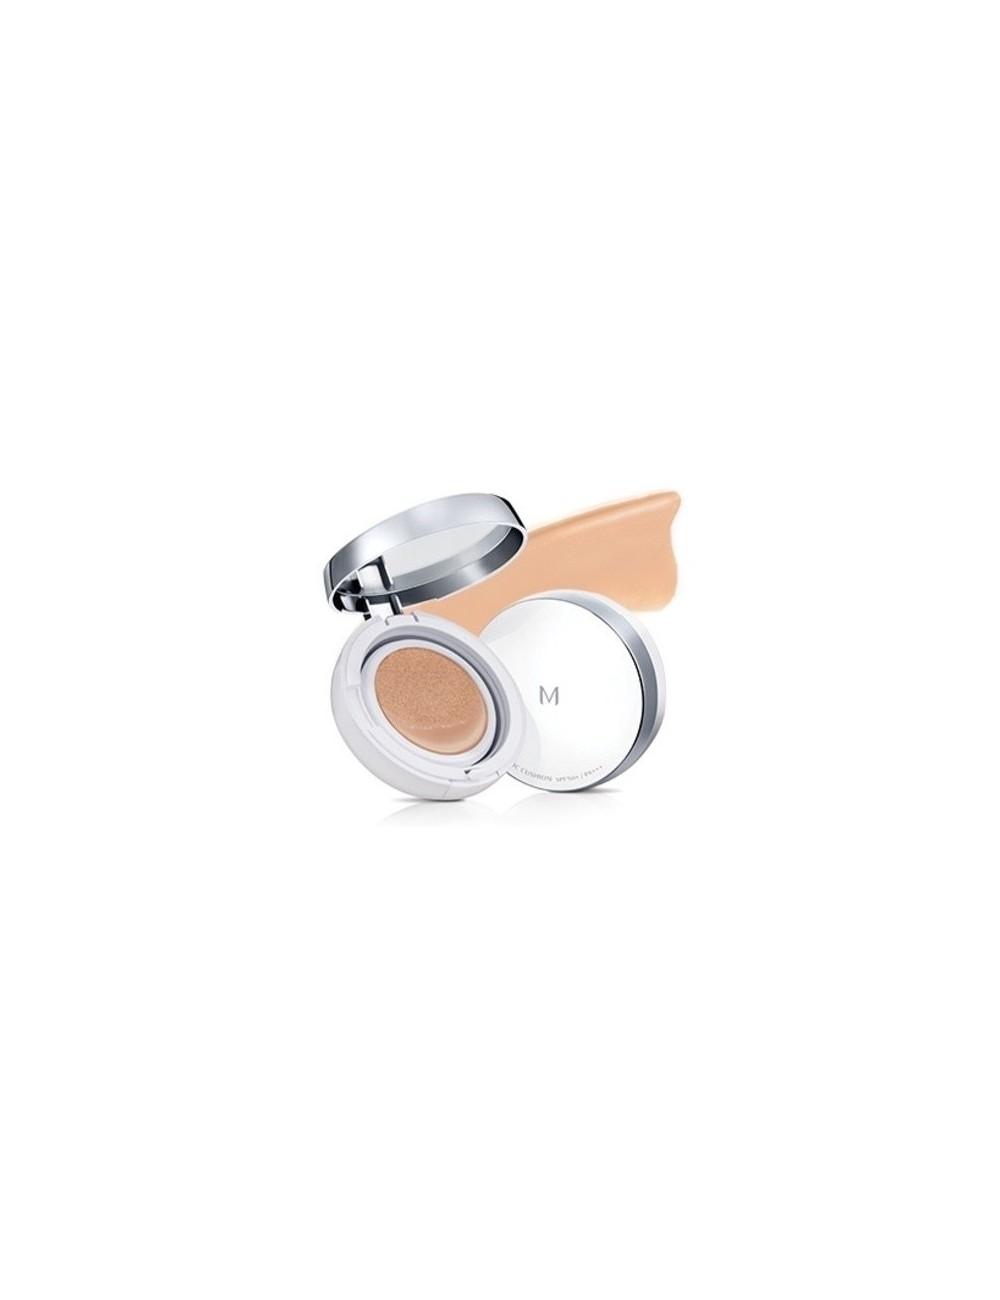 Maquillaje Cushion con Esponja Missha M Magic Cushion SPF50+/PA+++ 27